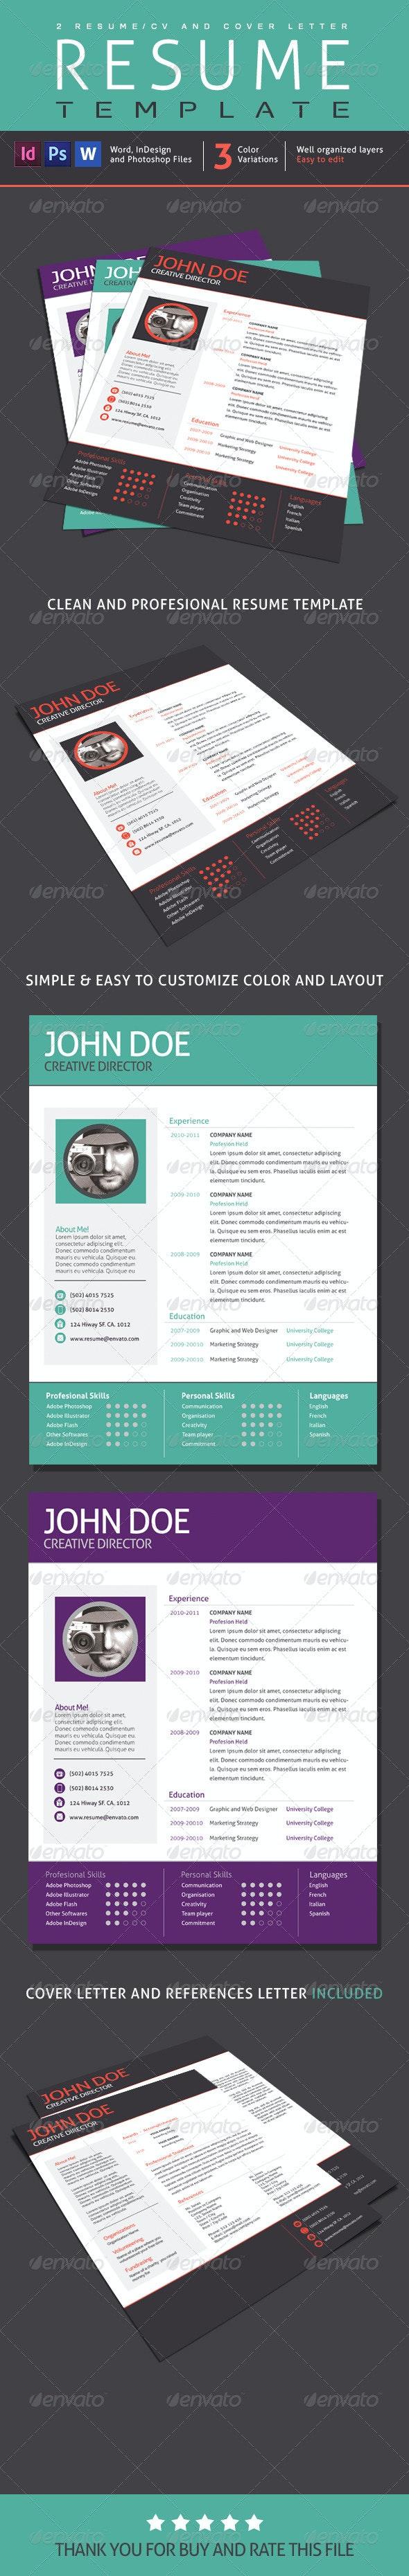 2 Resume Designs, 1 Cover Letter V01 - Resumes Stationery